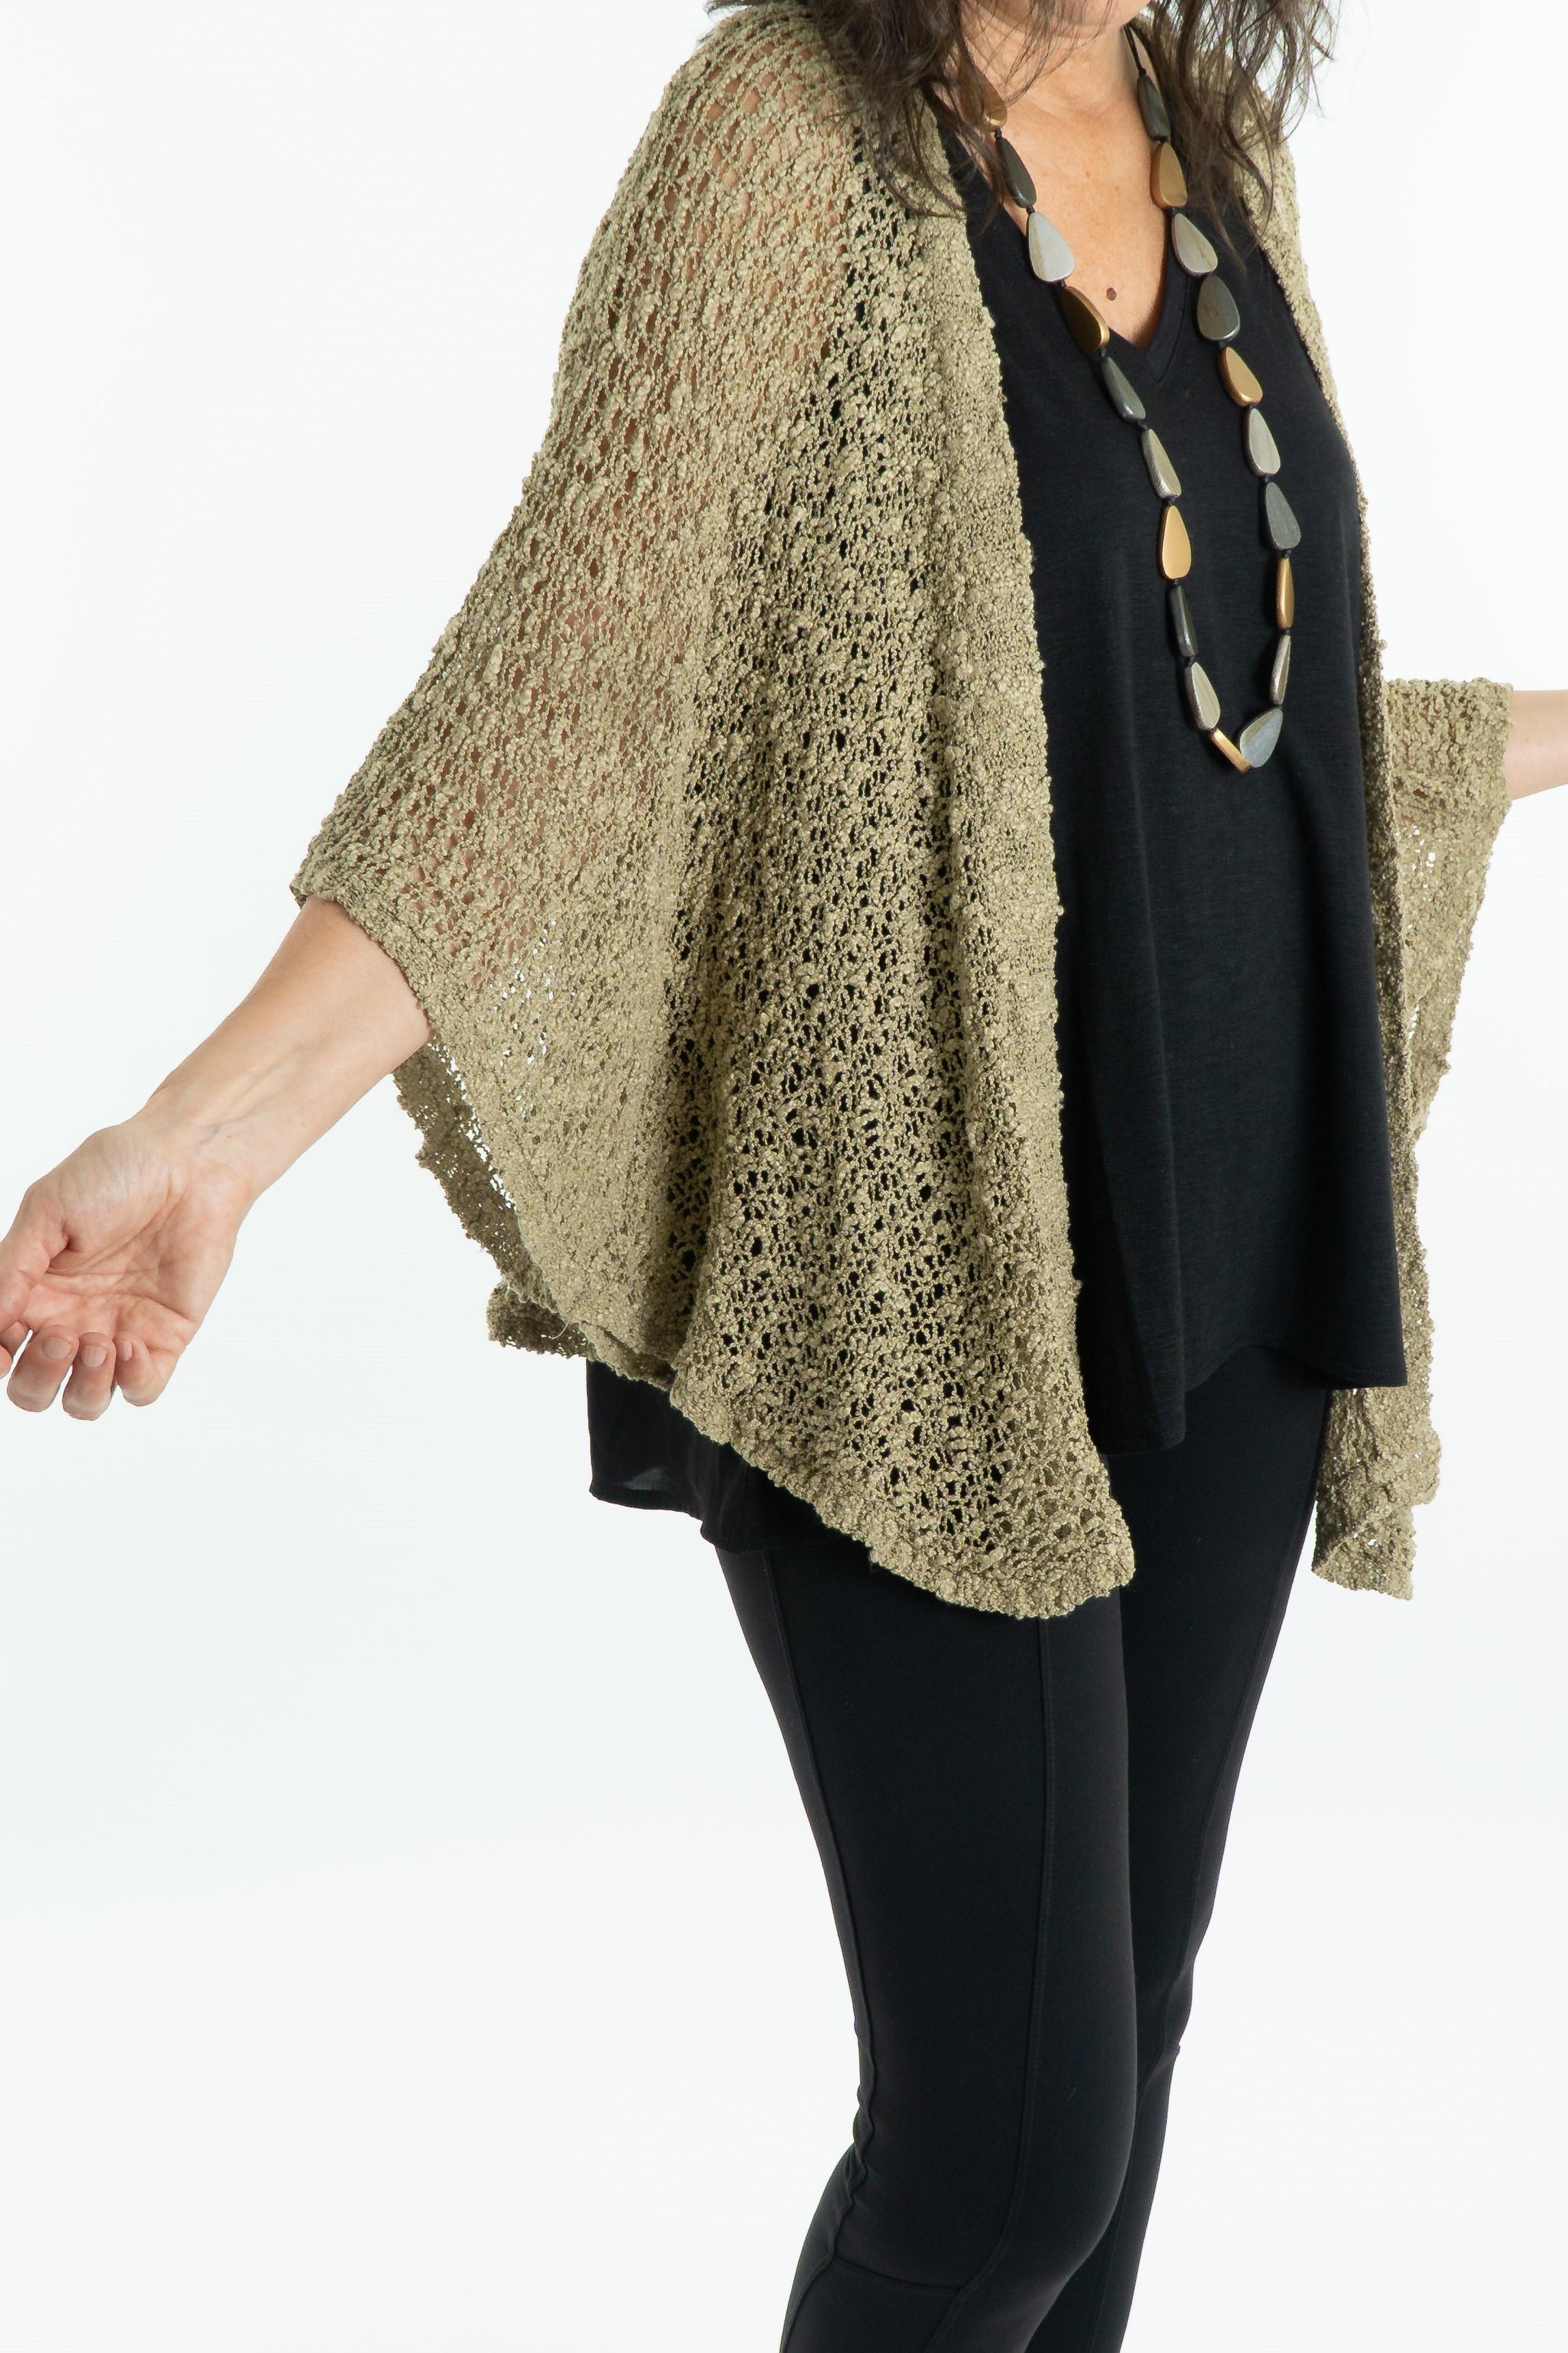 sand-pop-kimono-crop-1a.jpg